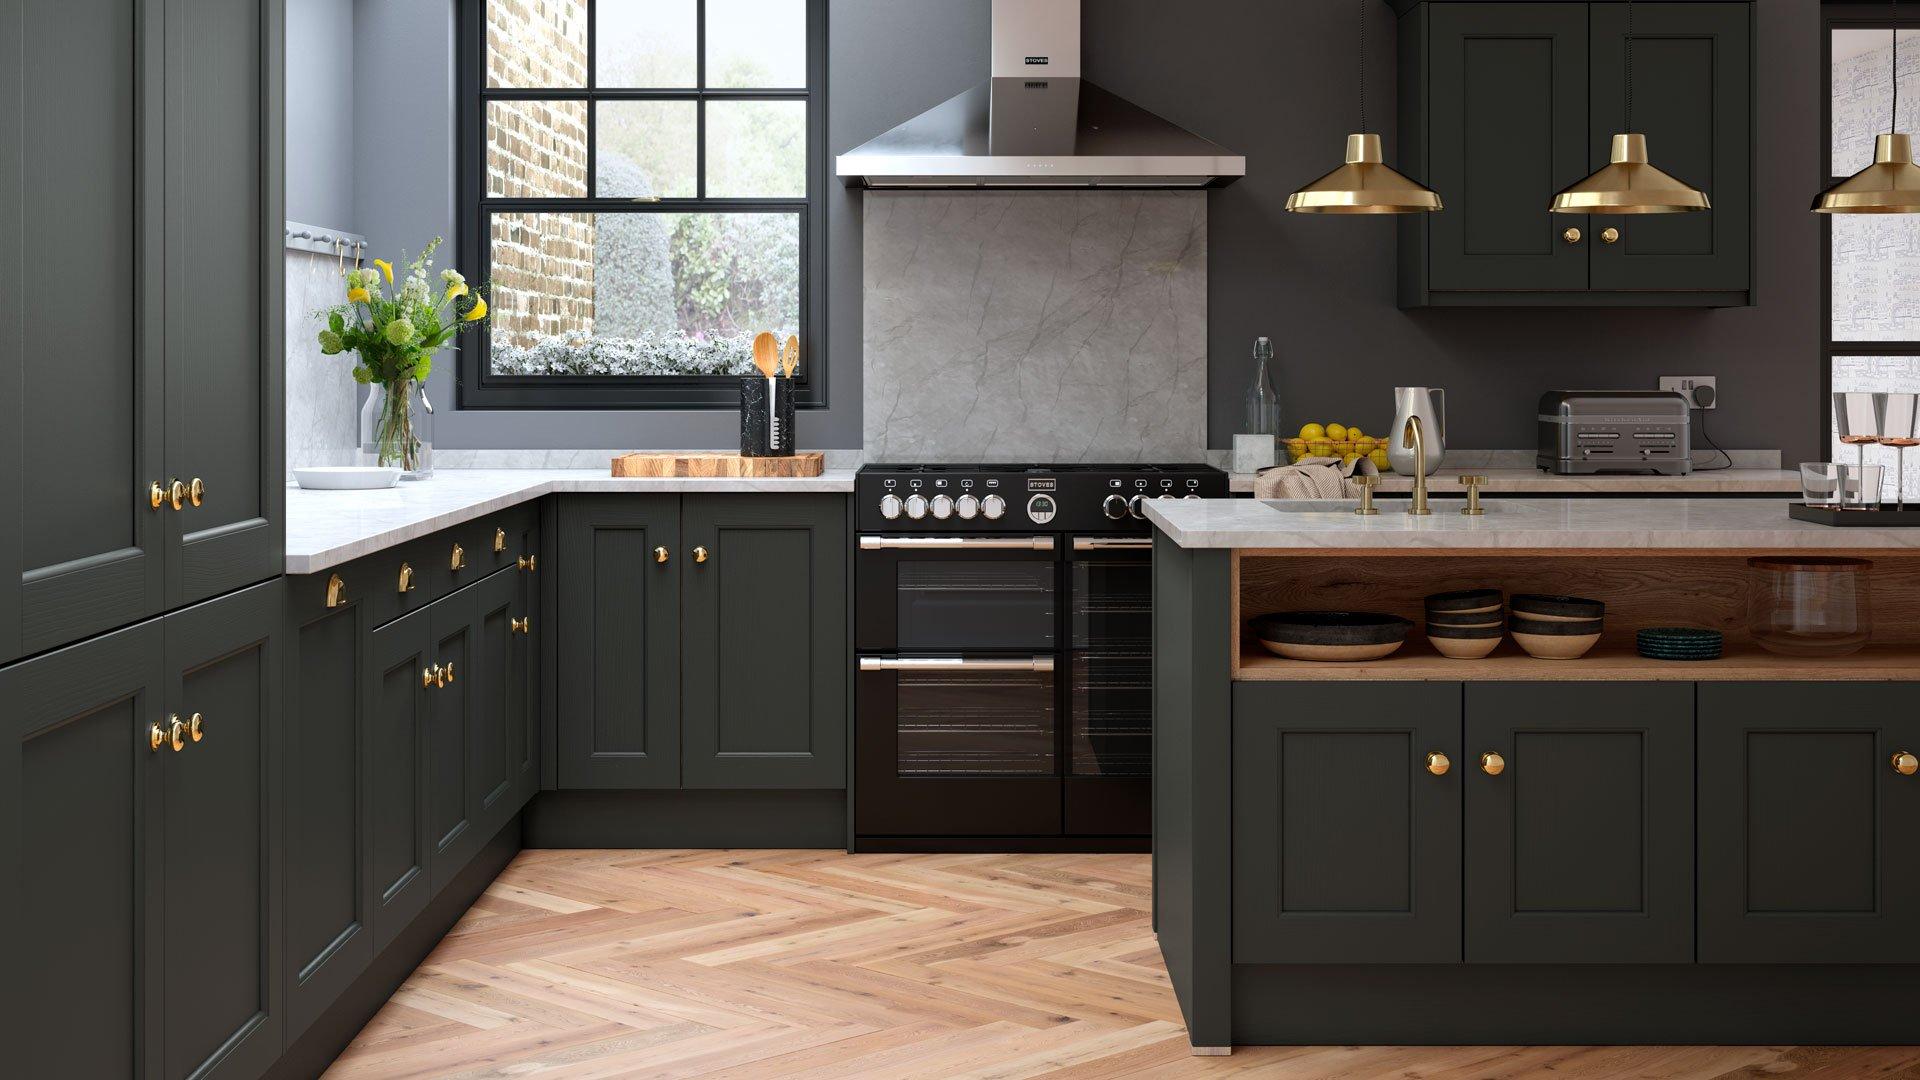 Multiwood Allestree Beaded Kitchen